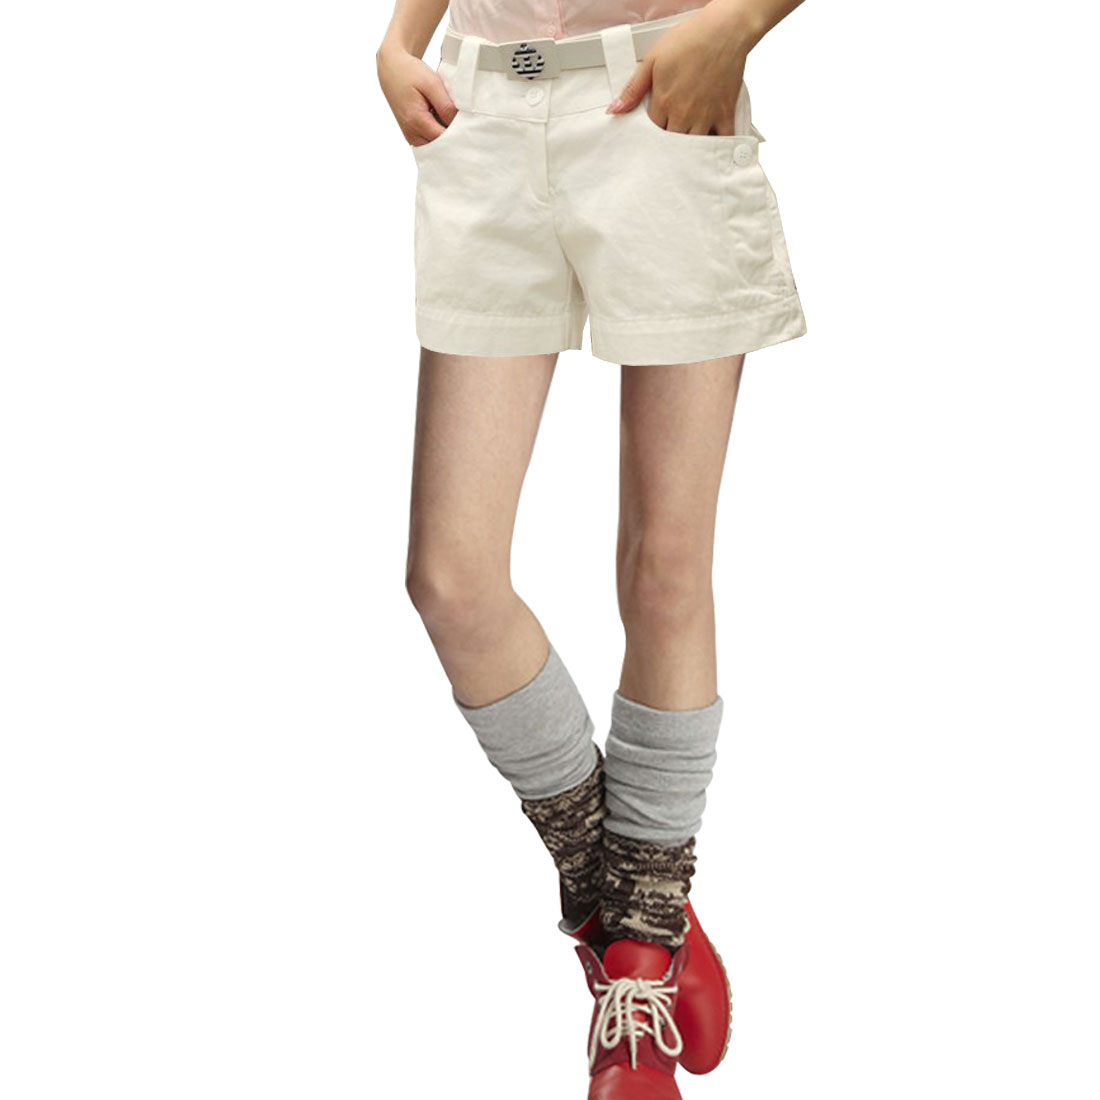 Lady White Elastic Waist Zip Botton Closure Mini Shorts M